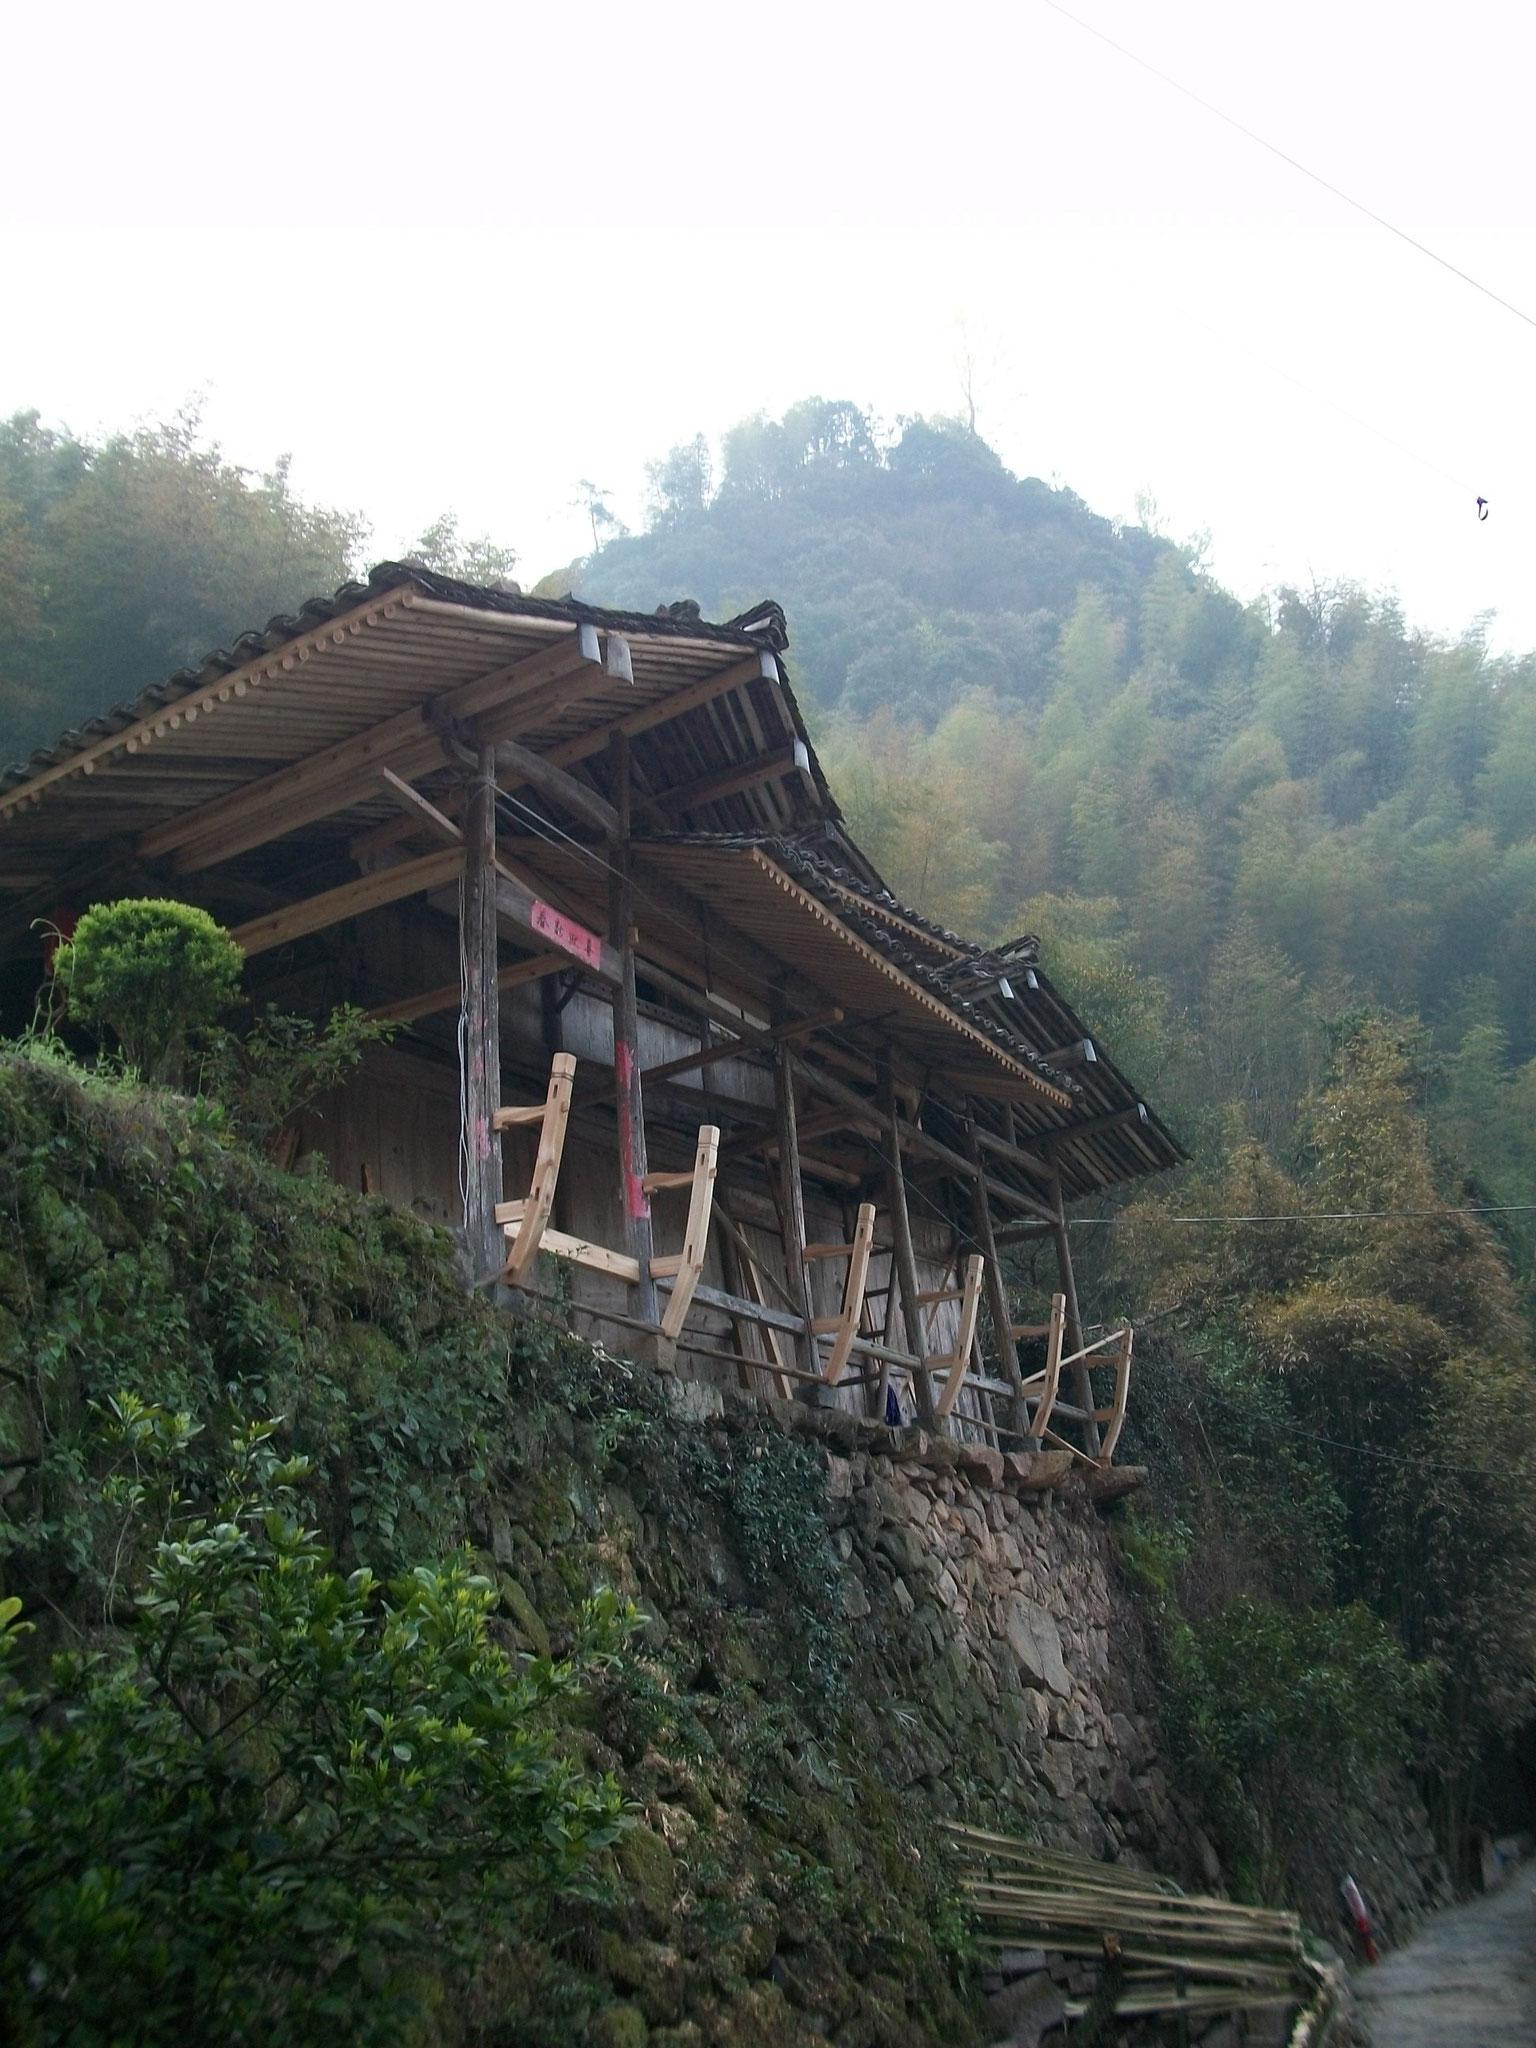 Holzbau im Dorf